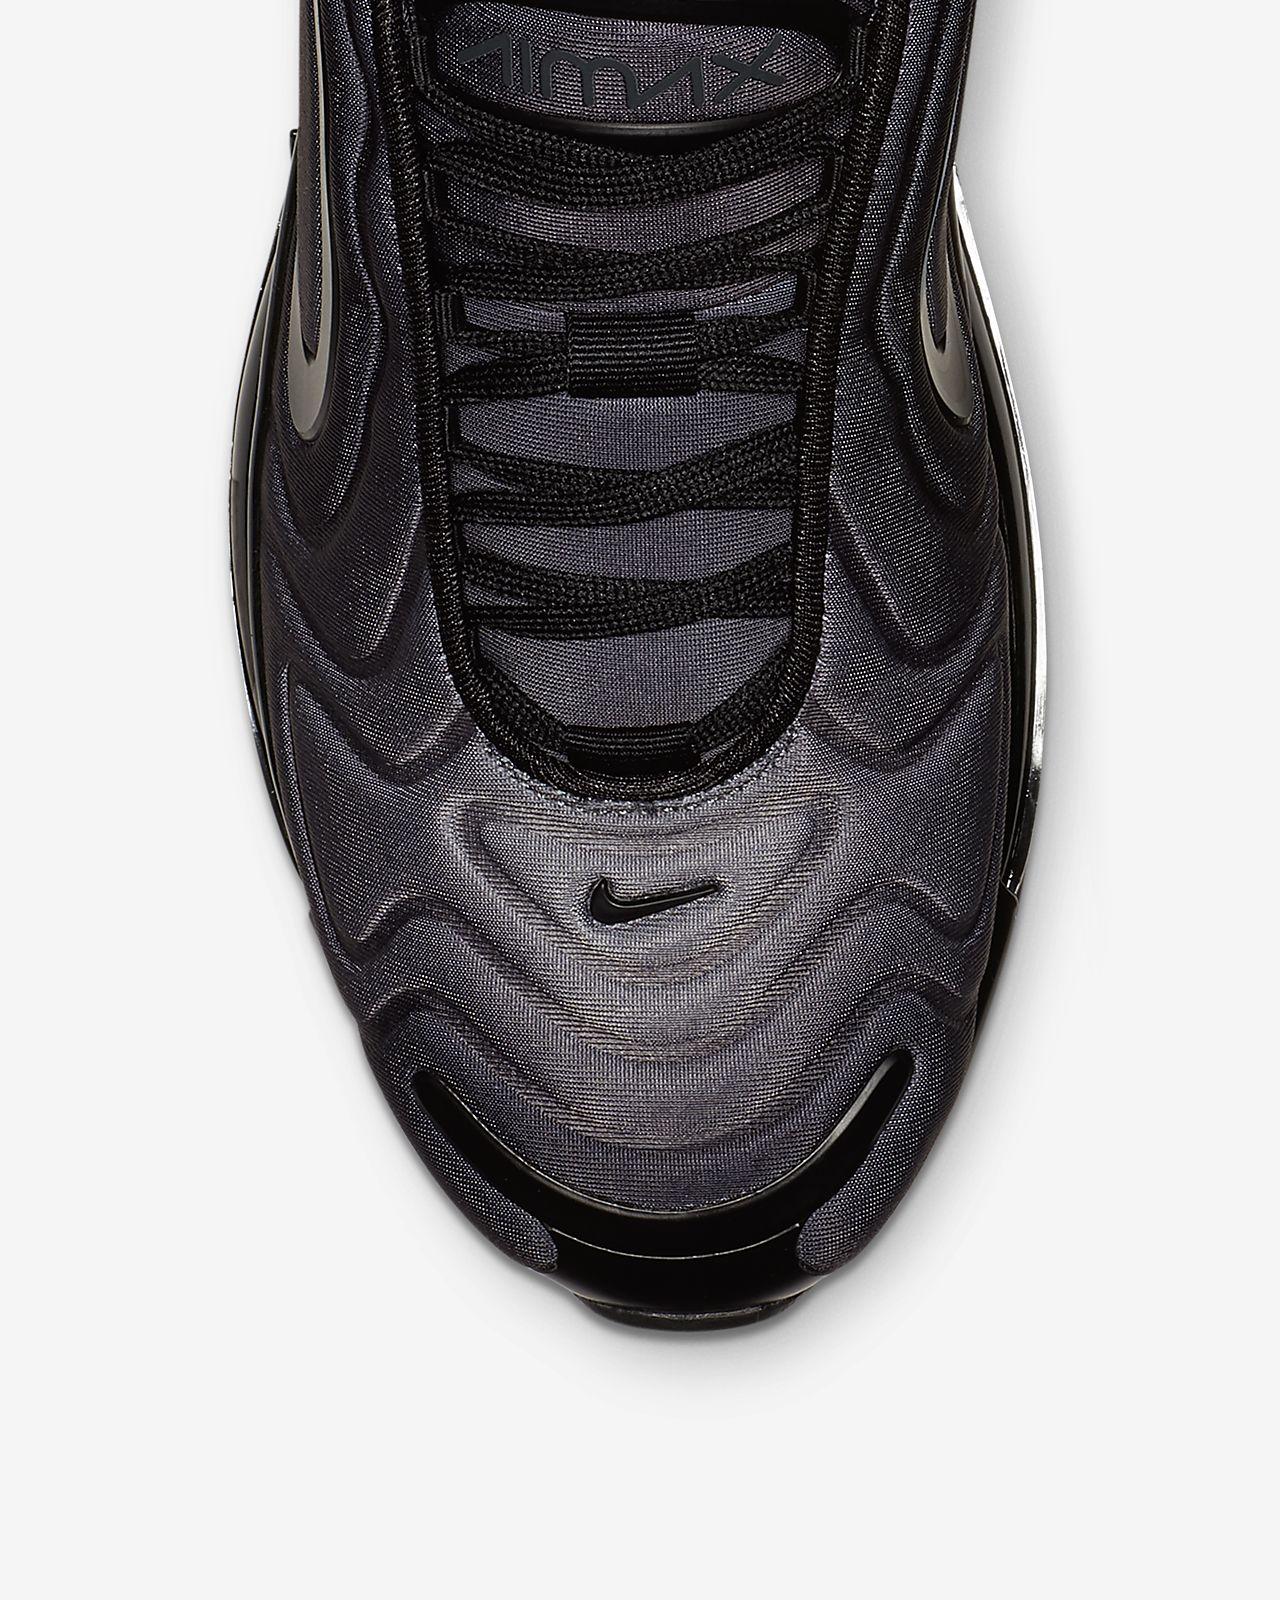 a2a19f30d63 Nike Air Max 720 Women s Shoe. Nike.com LU